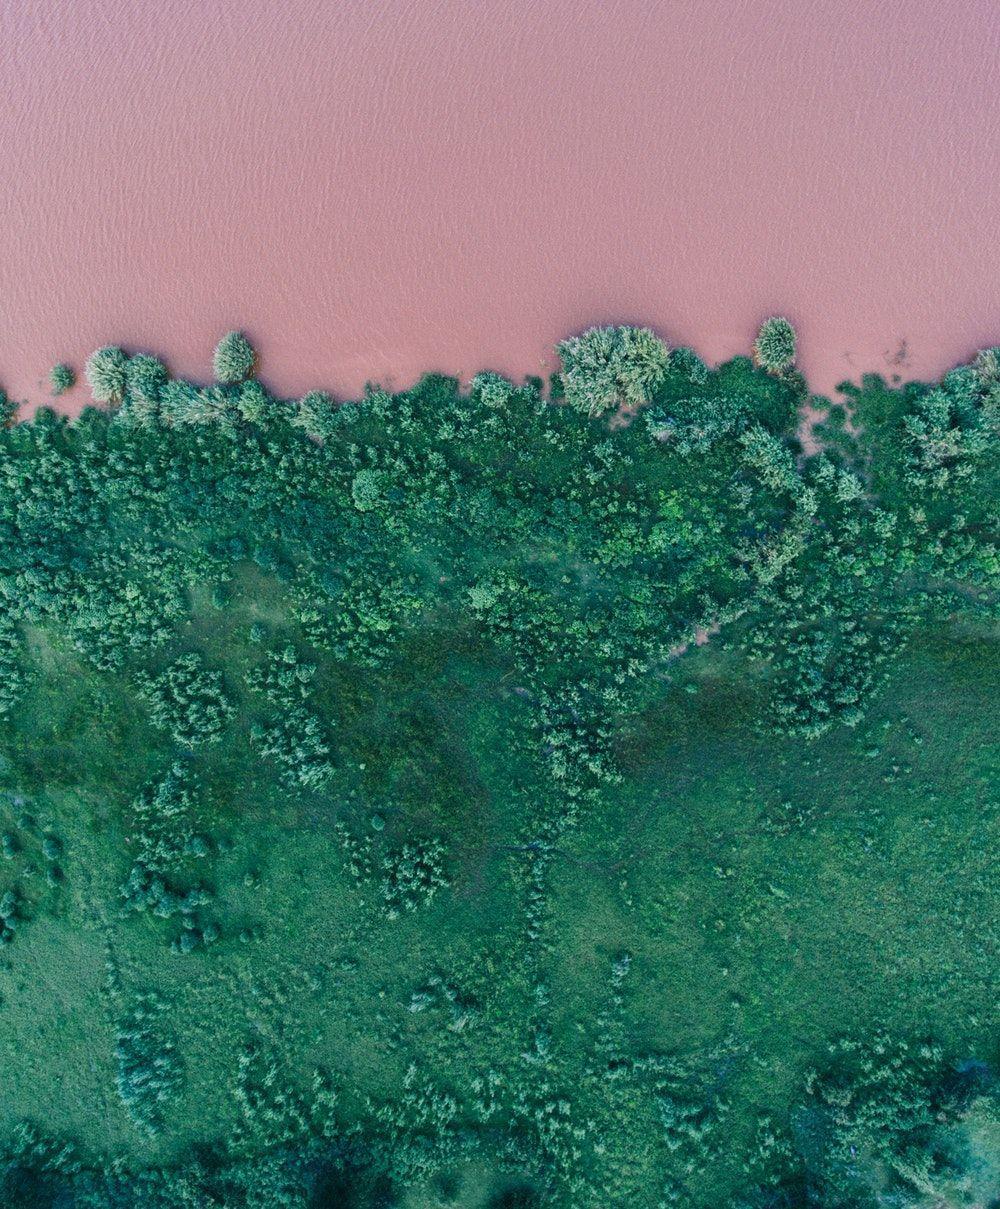 Green Aesthetics Wallpapers - Wallpaper Cave